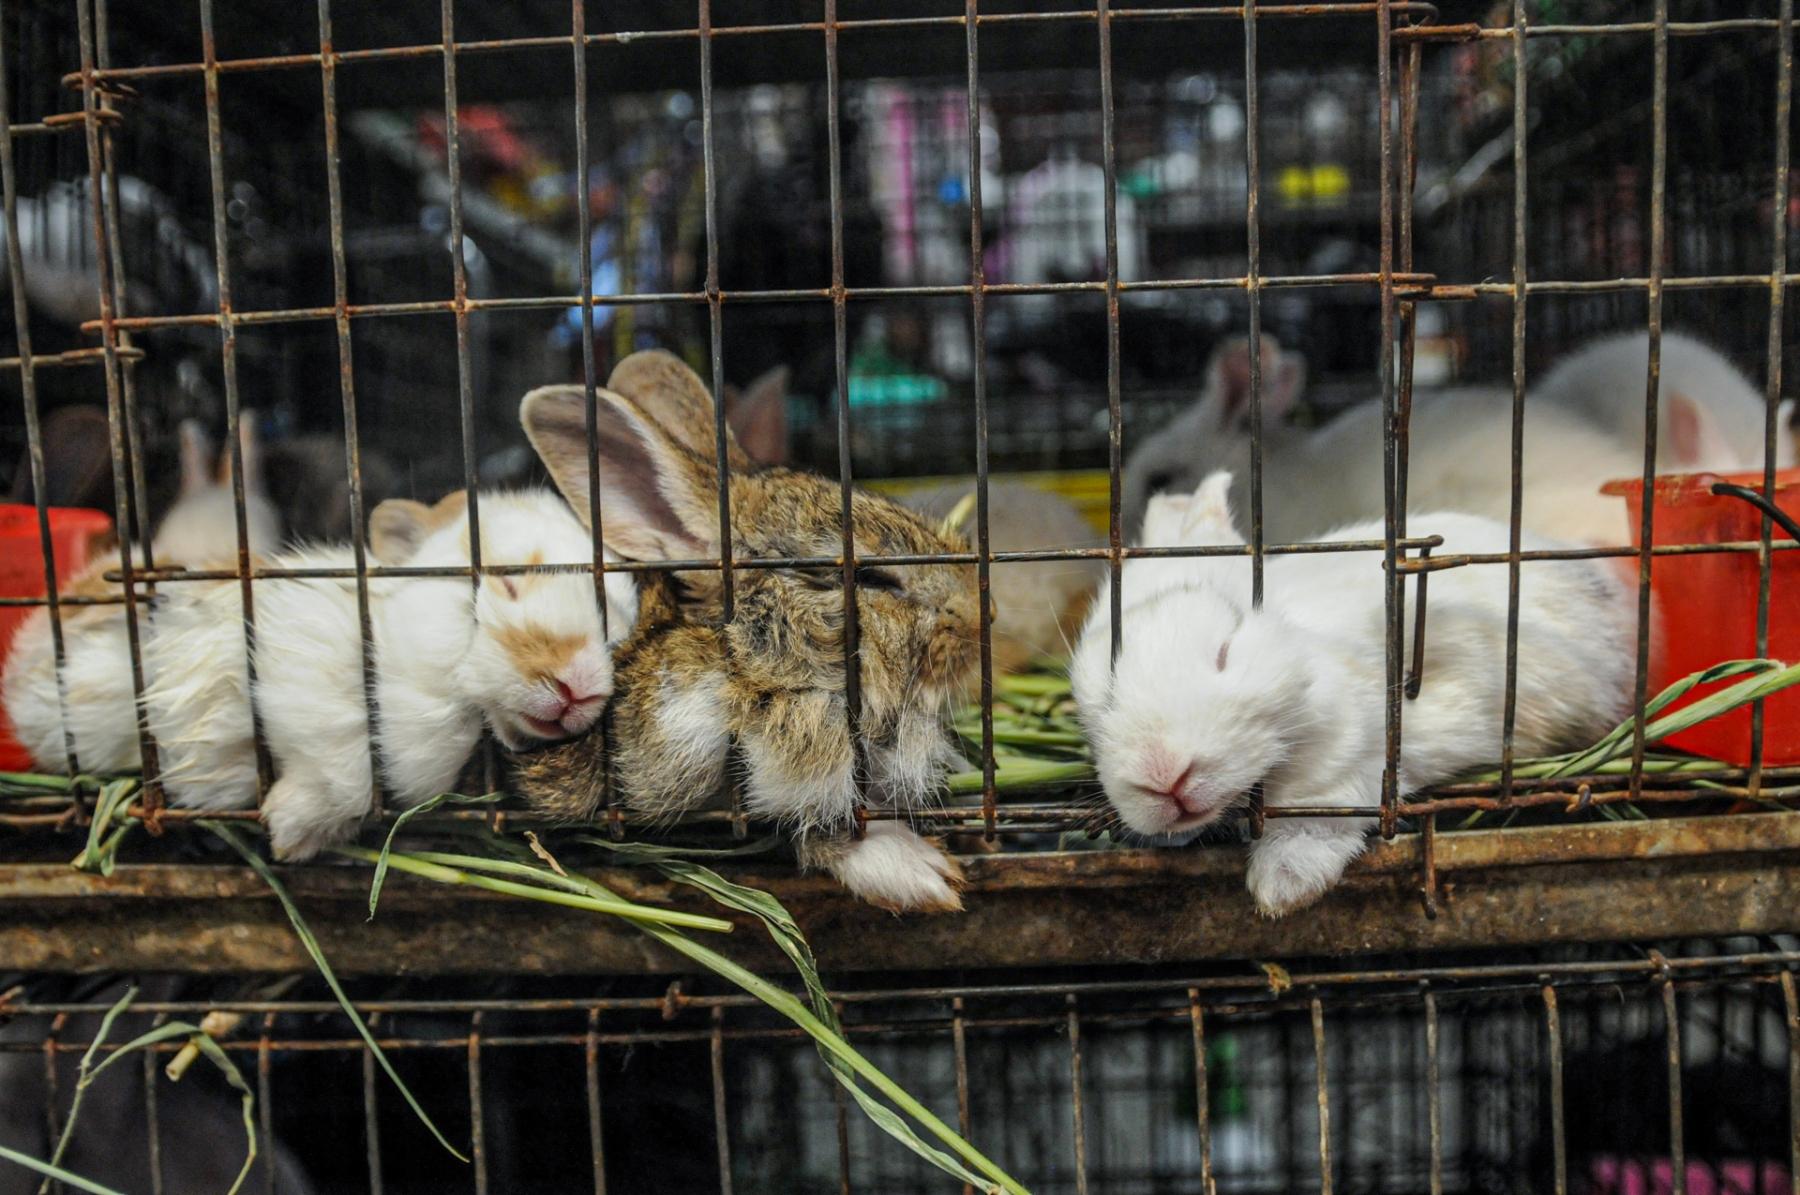 Animal Markets - We Animals Media